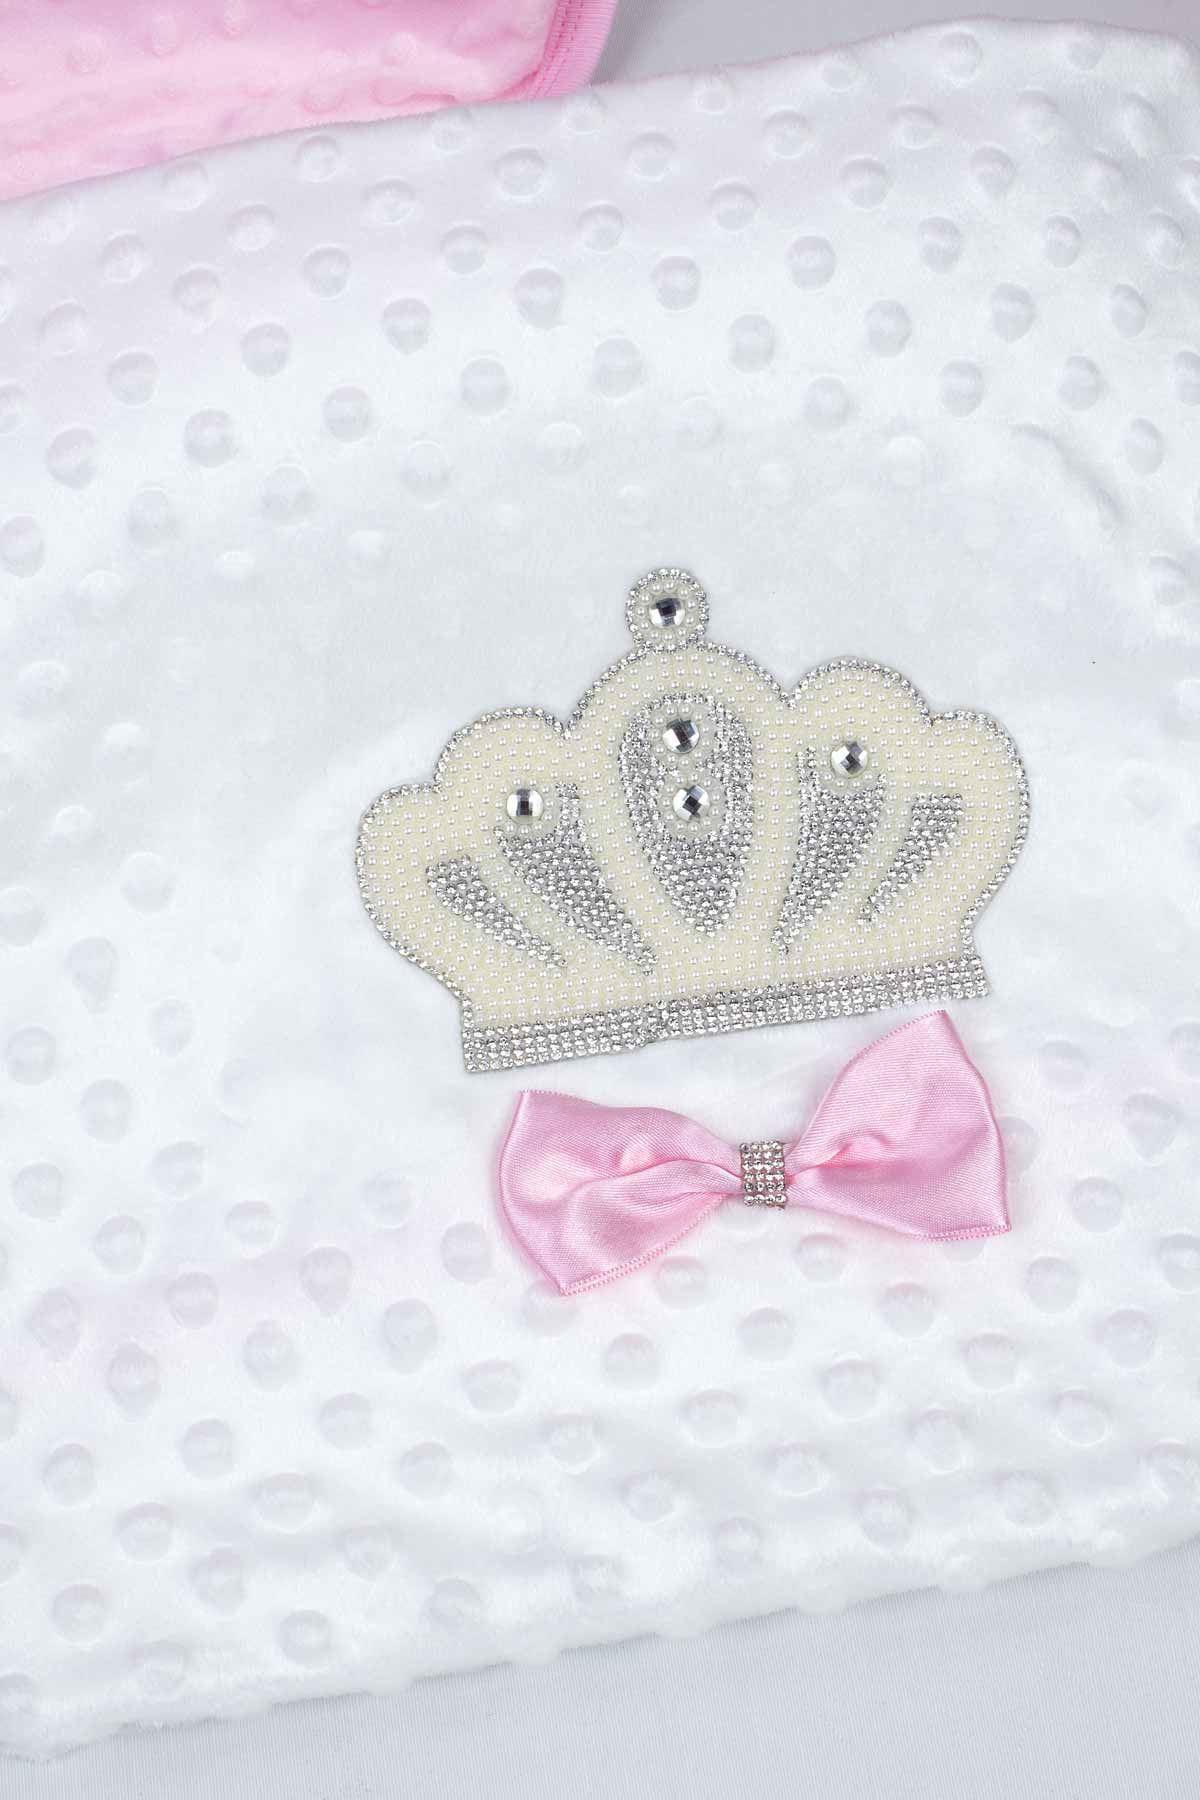 White Girl Baby Blanket King Queen Girls Babies Newborn Crown Embossed Ultra Soft Antibacterial Infants Girls Princess Models